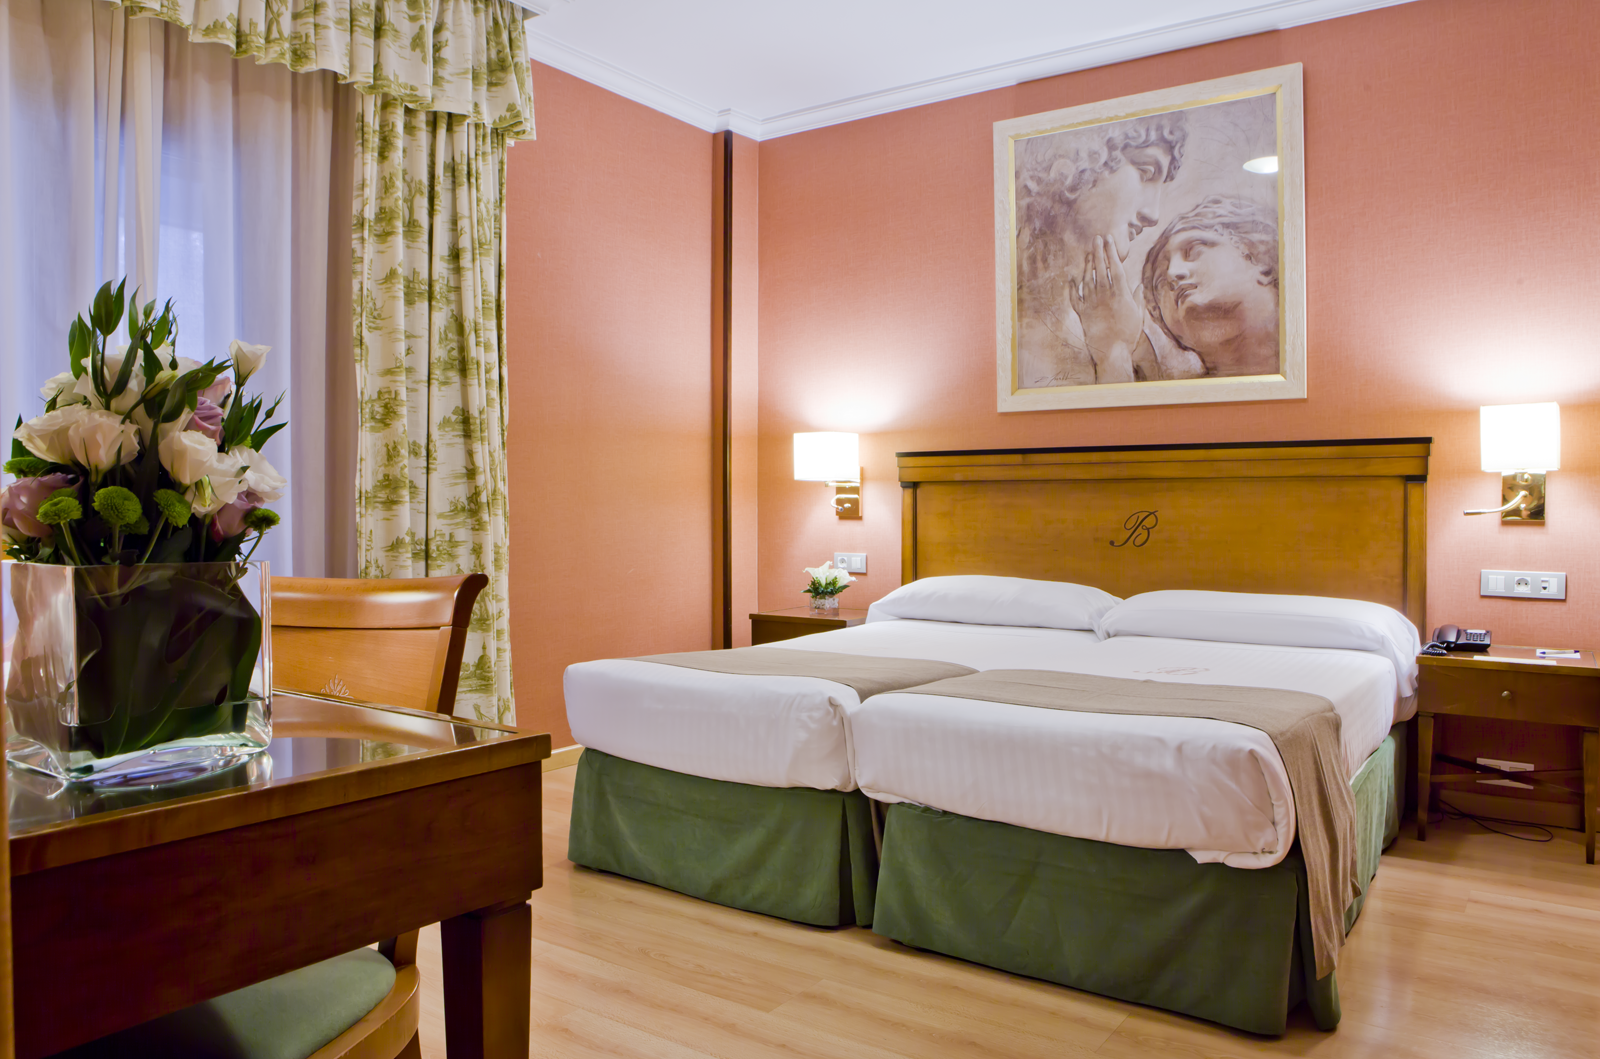 hotel becquer seville: